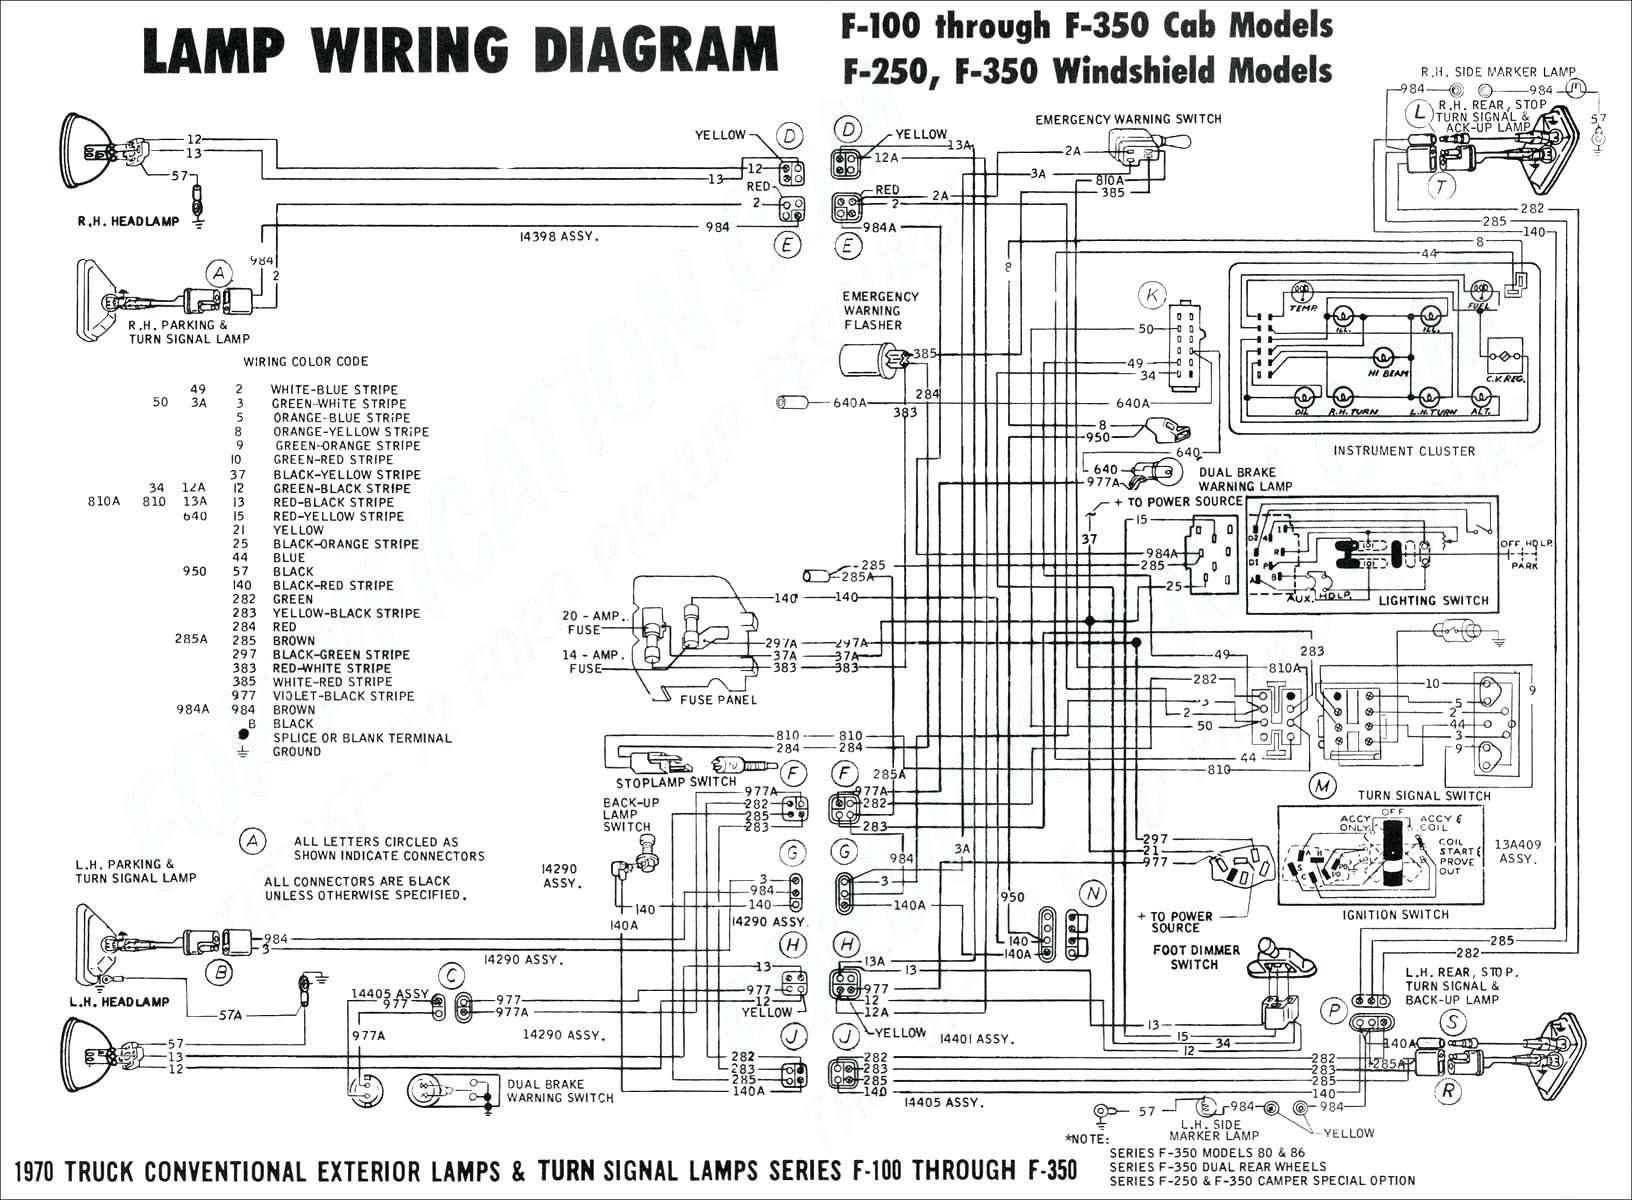 Bosch Diagram Wiring Alternator 66201744 - Wiring Liry Diagrams on